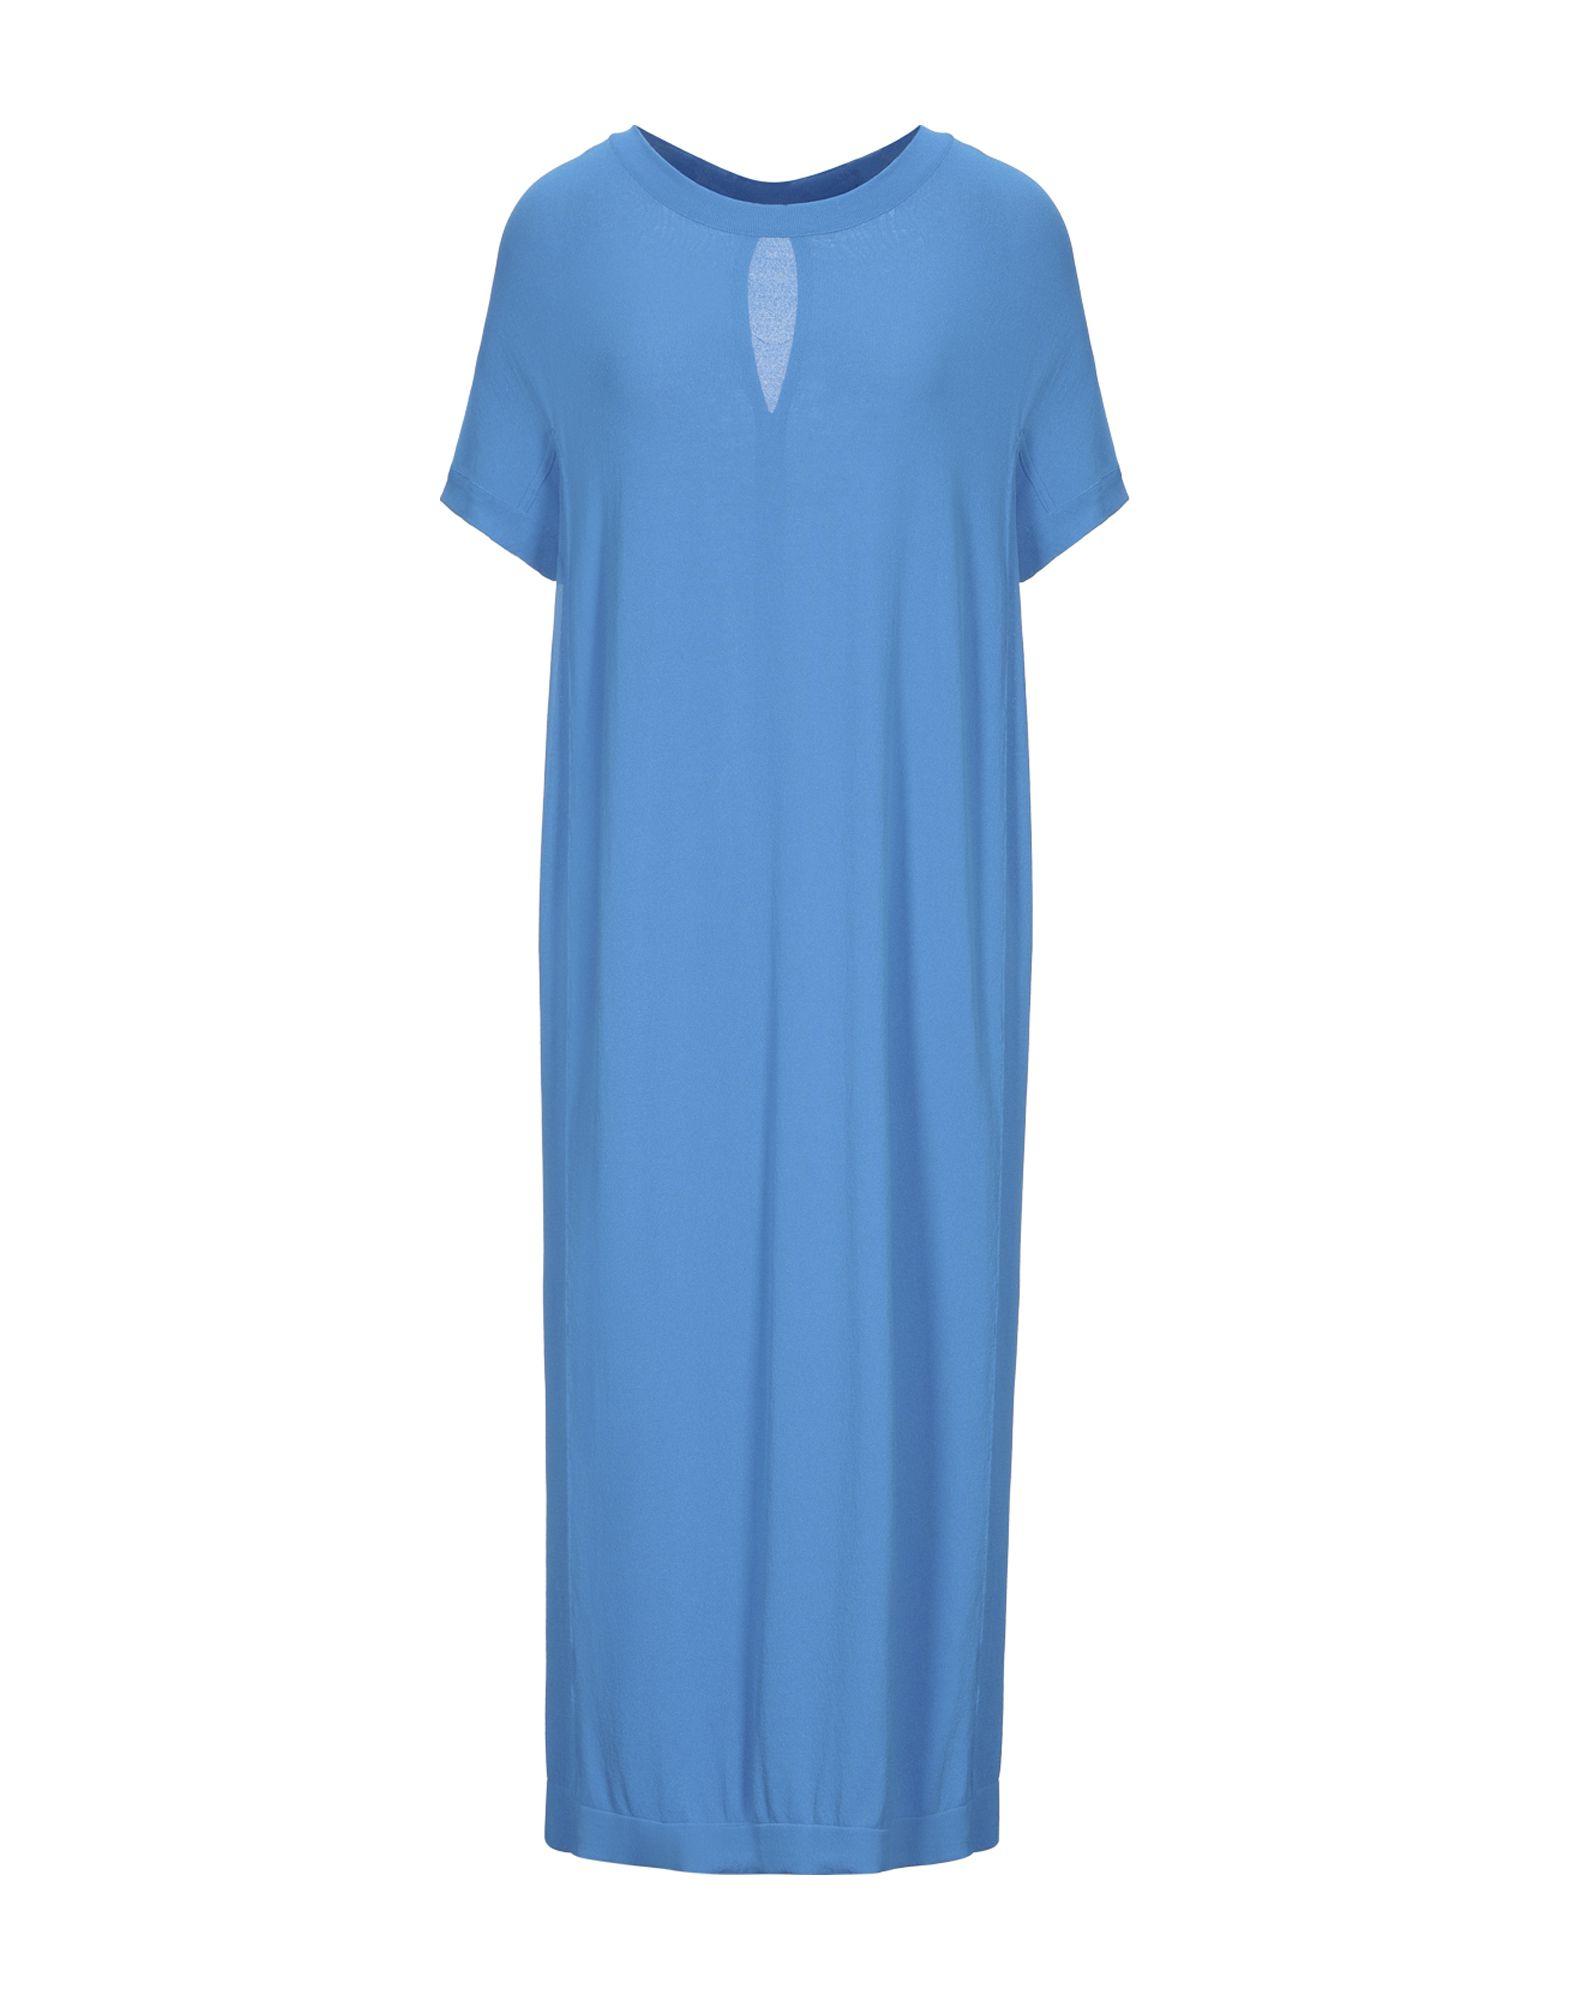 BRUNO MANETTI Короткое платье недорого